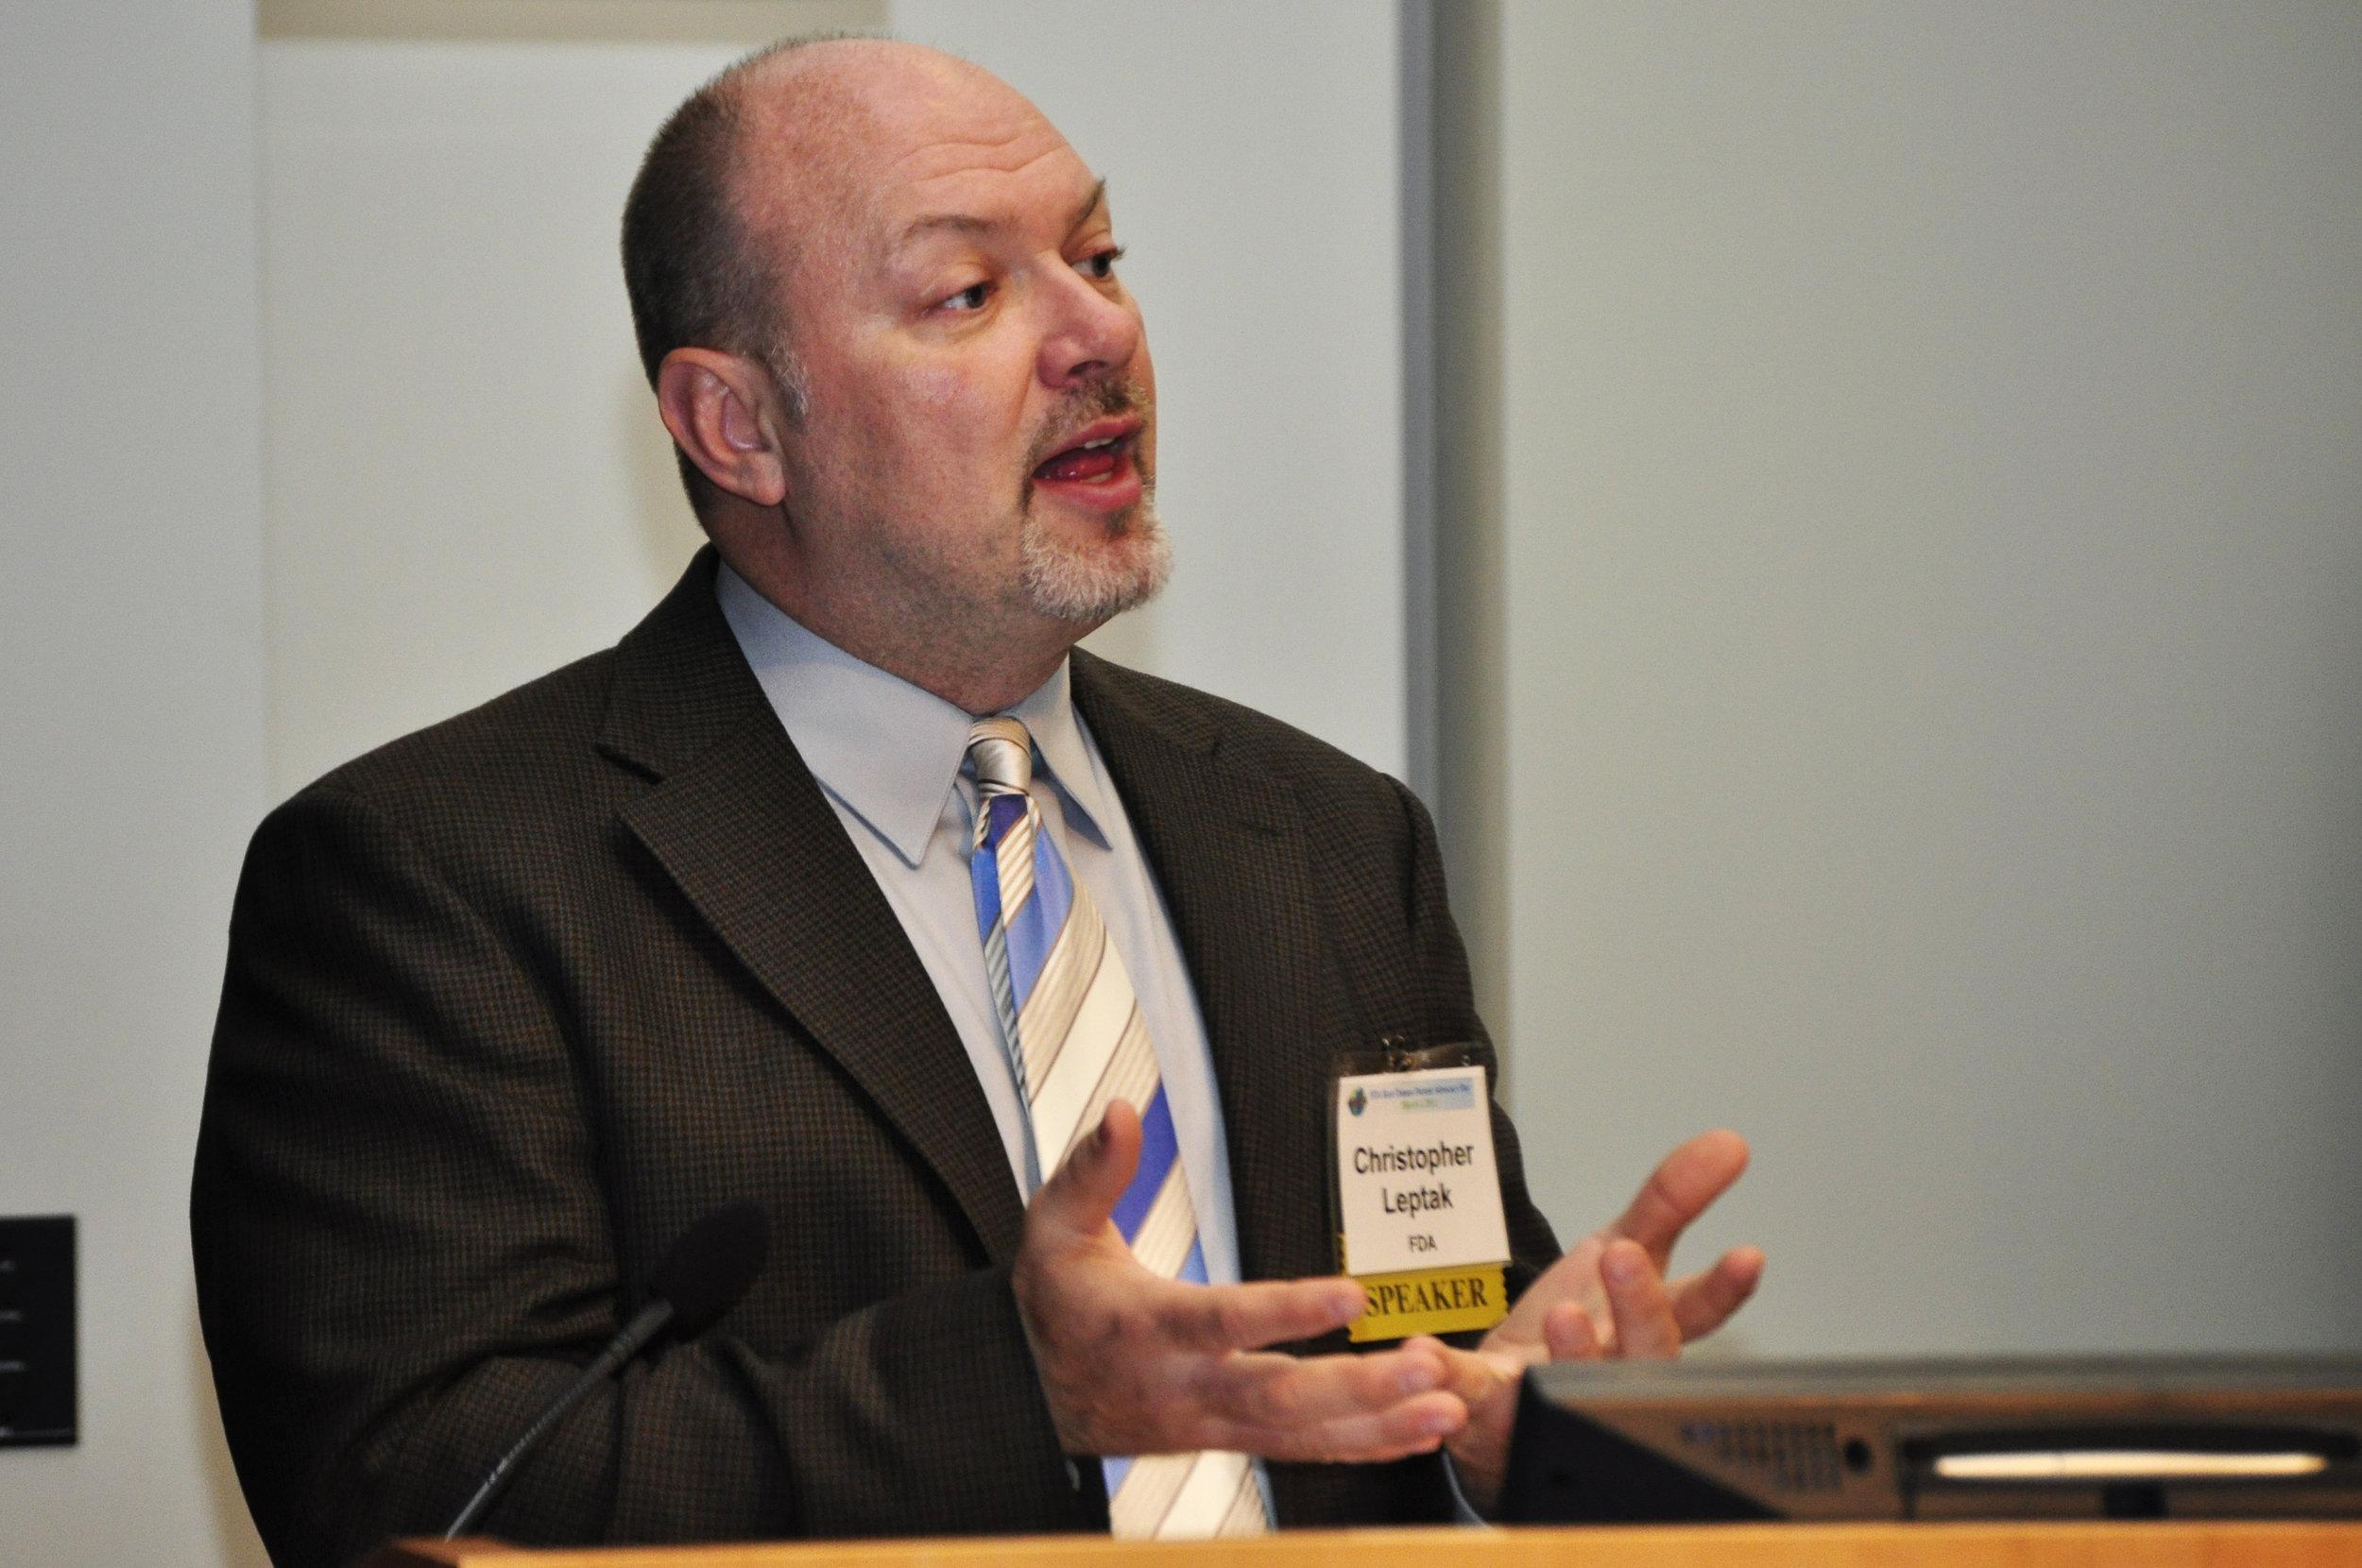 Cristopher Leptak (FDA, USA)